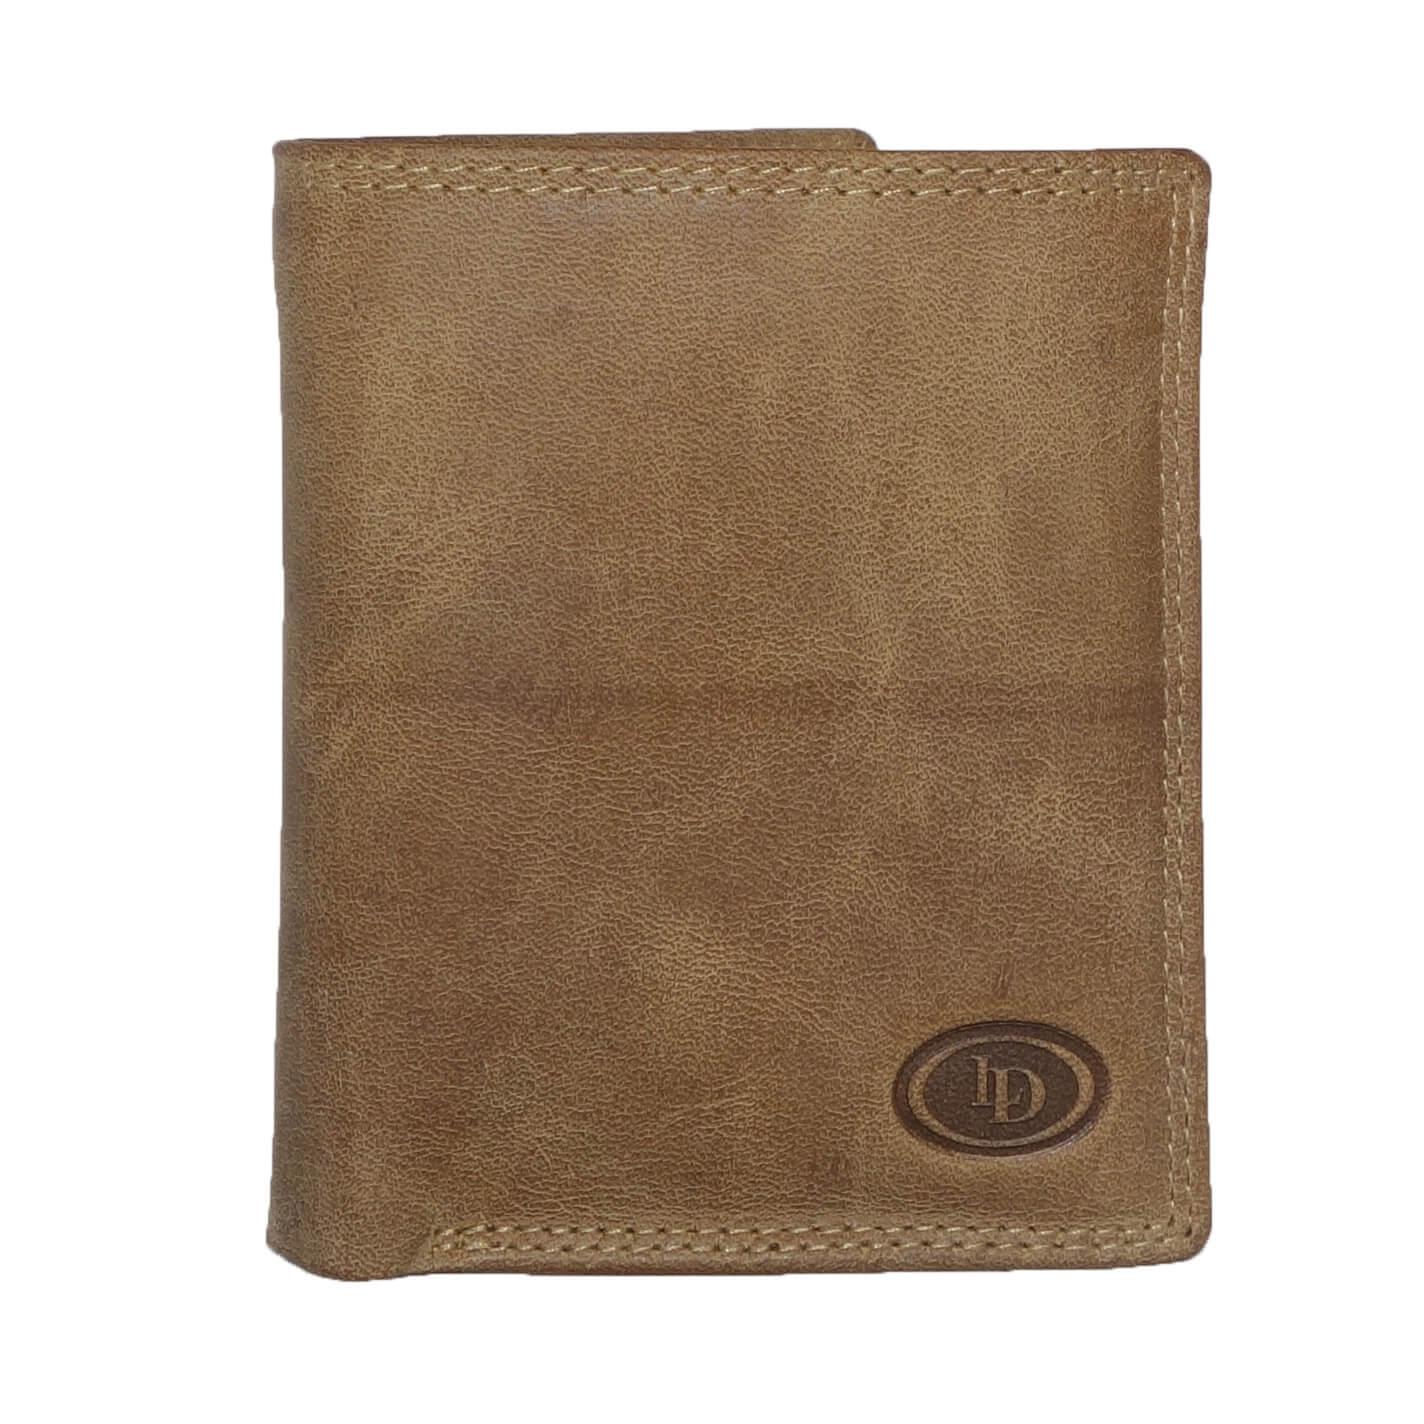 Leather Design Portemonnee met Secrid Cardprotector Vak Bruin-0